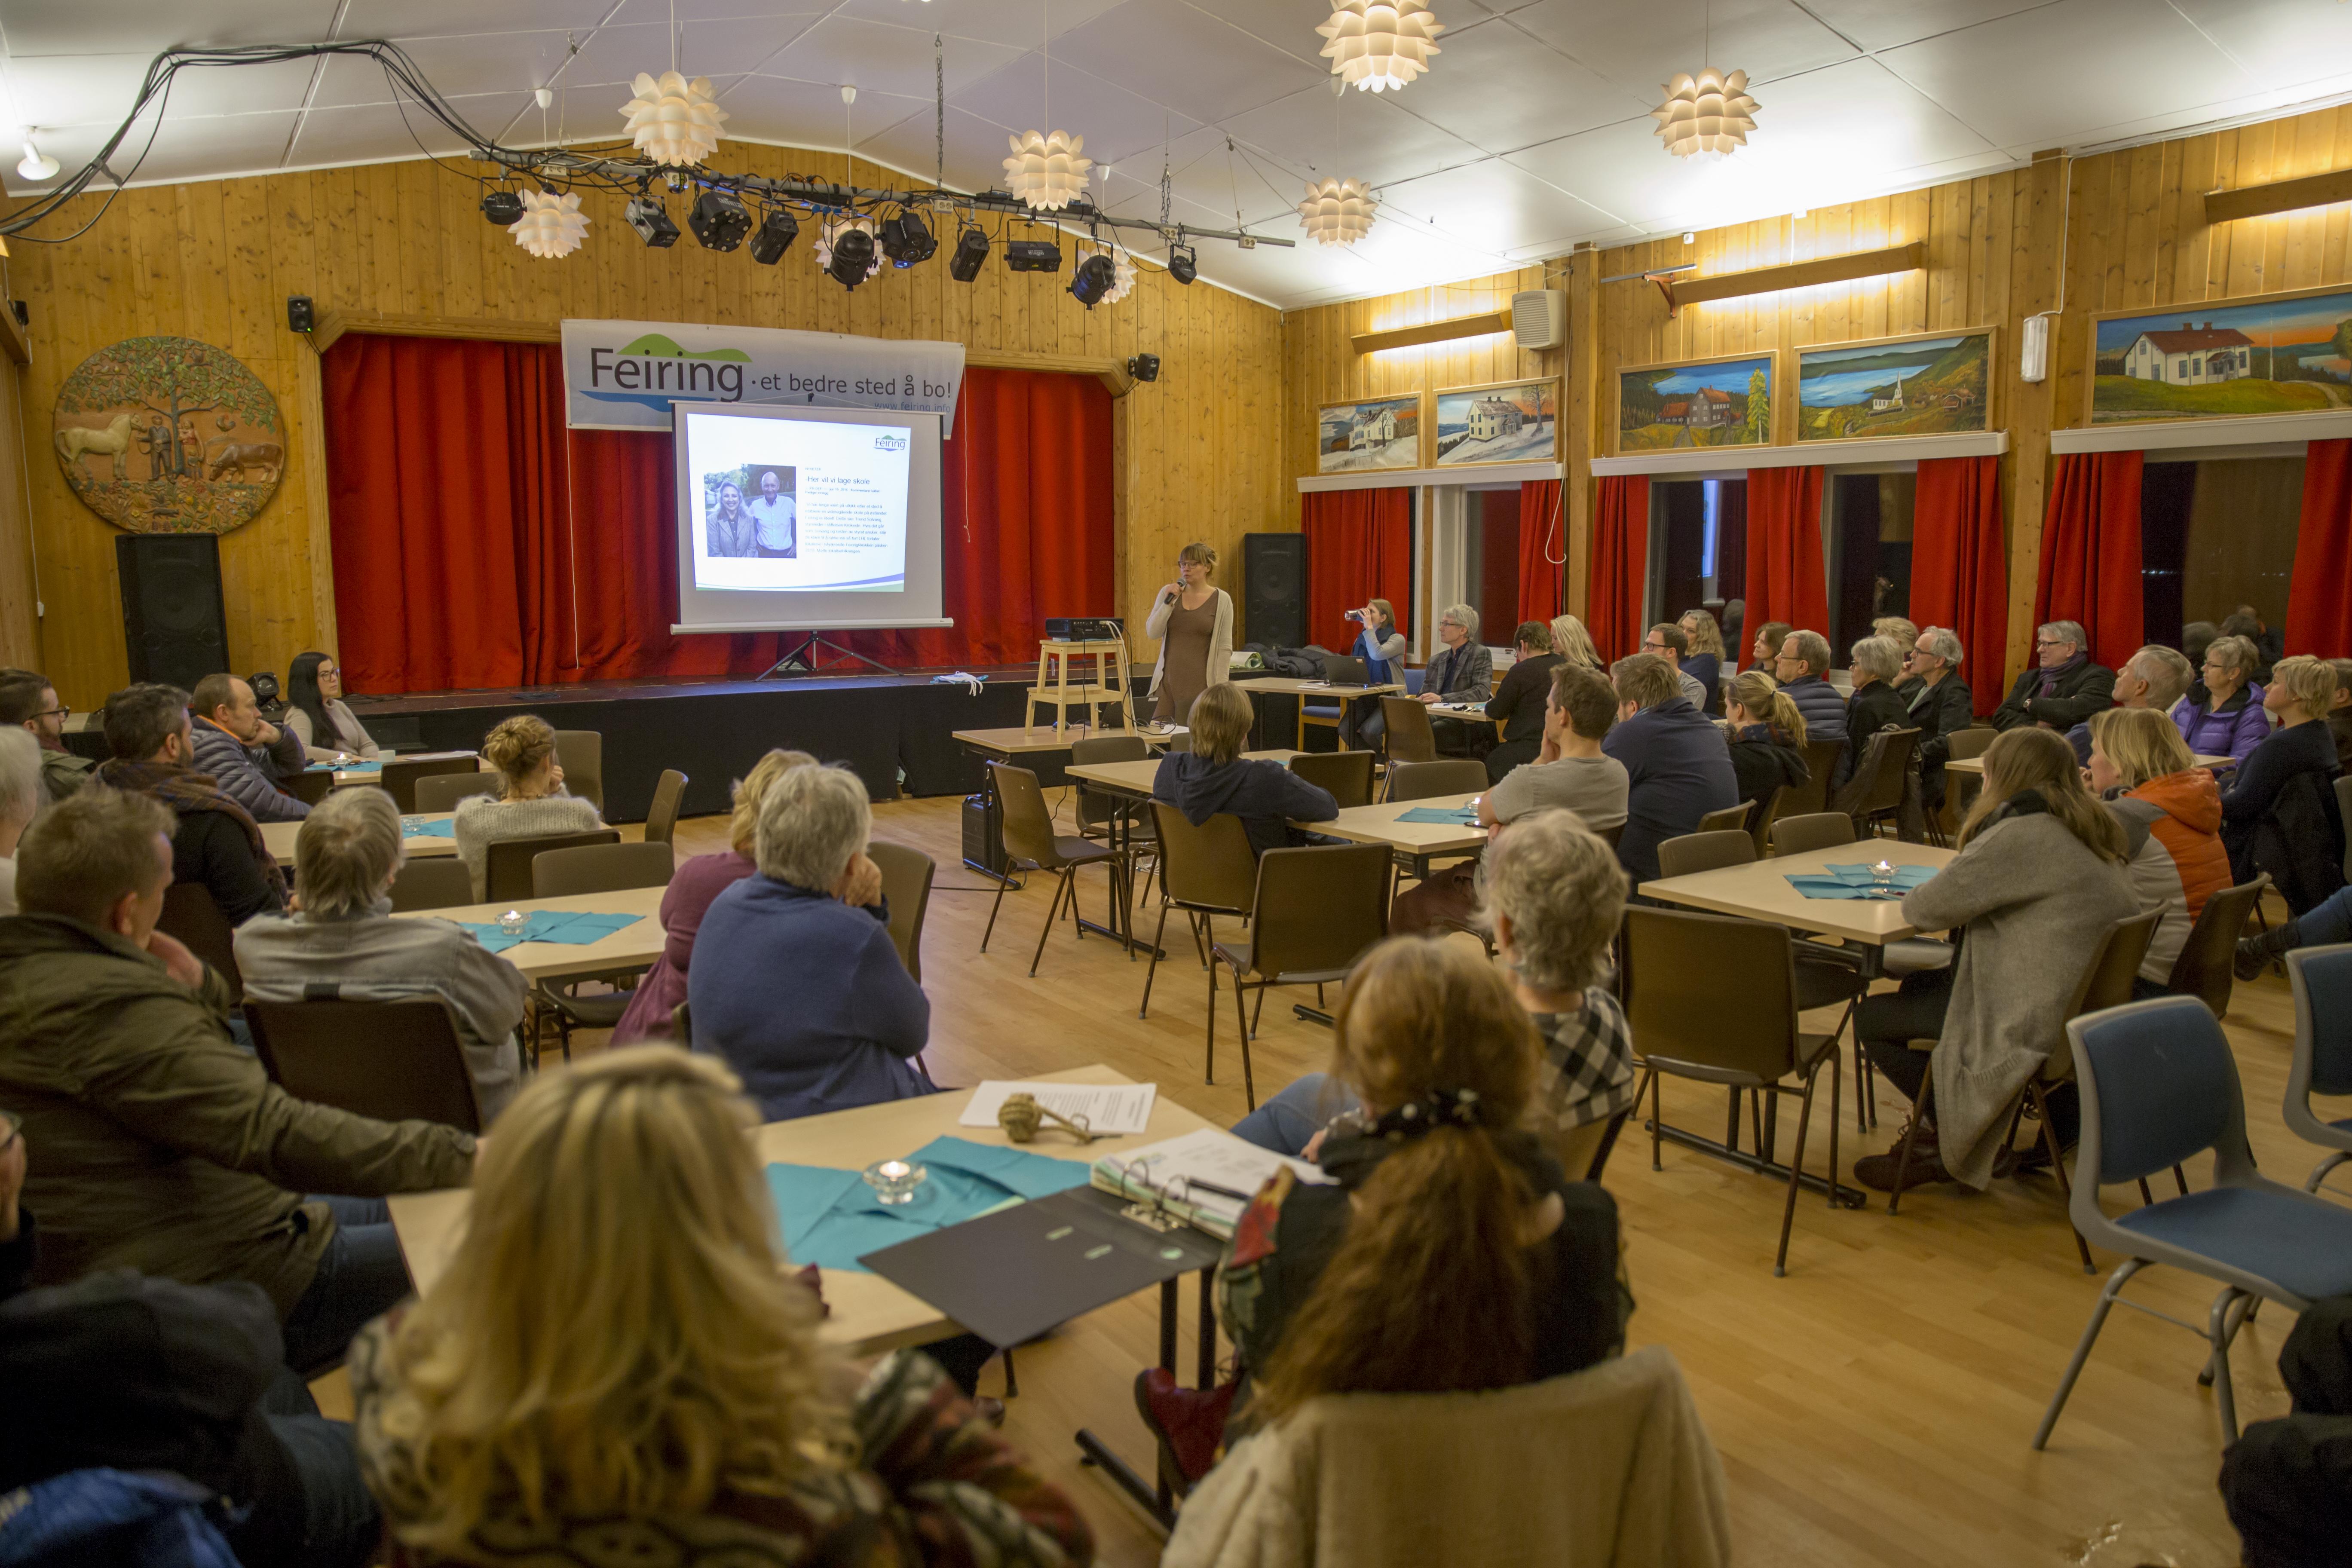 Feiringtinget 2019 og årsmøte i Feiring ungdomslag